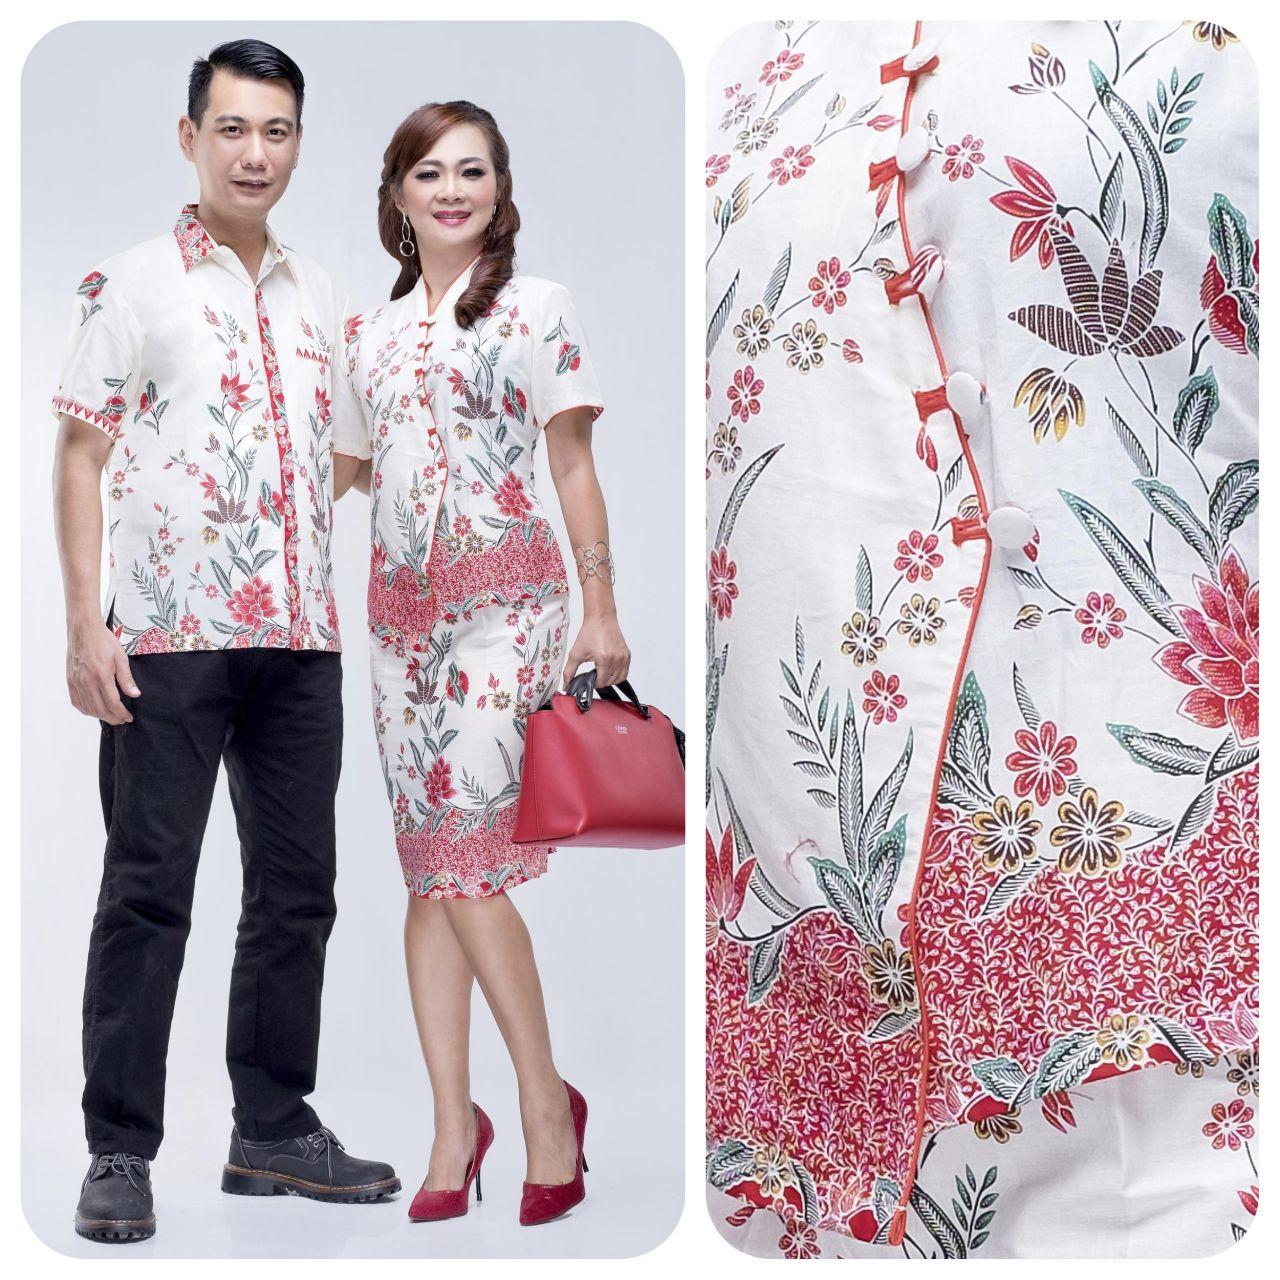 atasan batik modern, model atasan batik terbaru, batik pasangan. Source · 8632304_ae9b0090-85ed-4036-bc44-b575c31ffb84_1280_1280.jpg